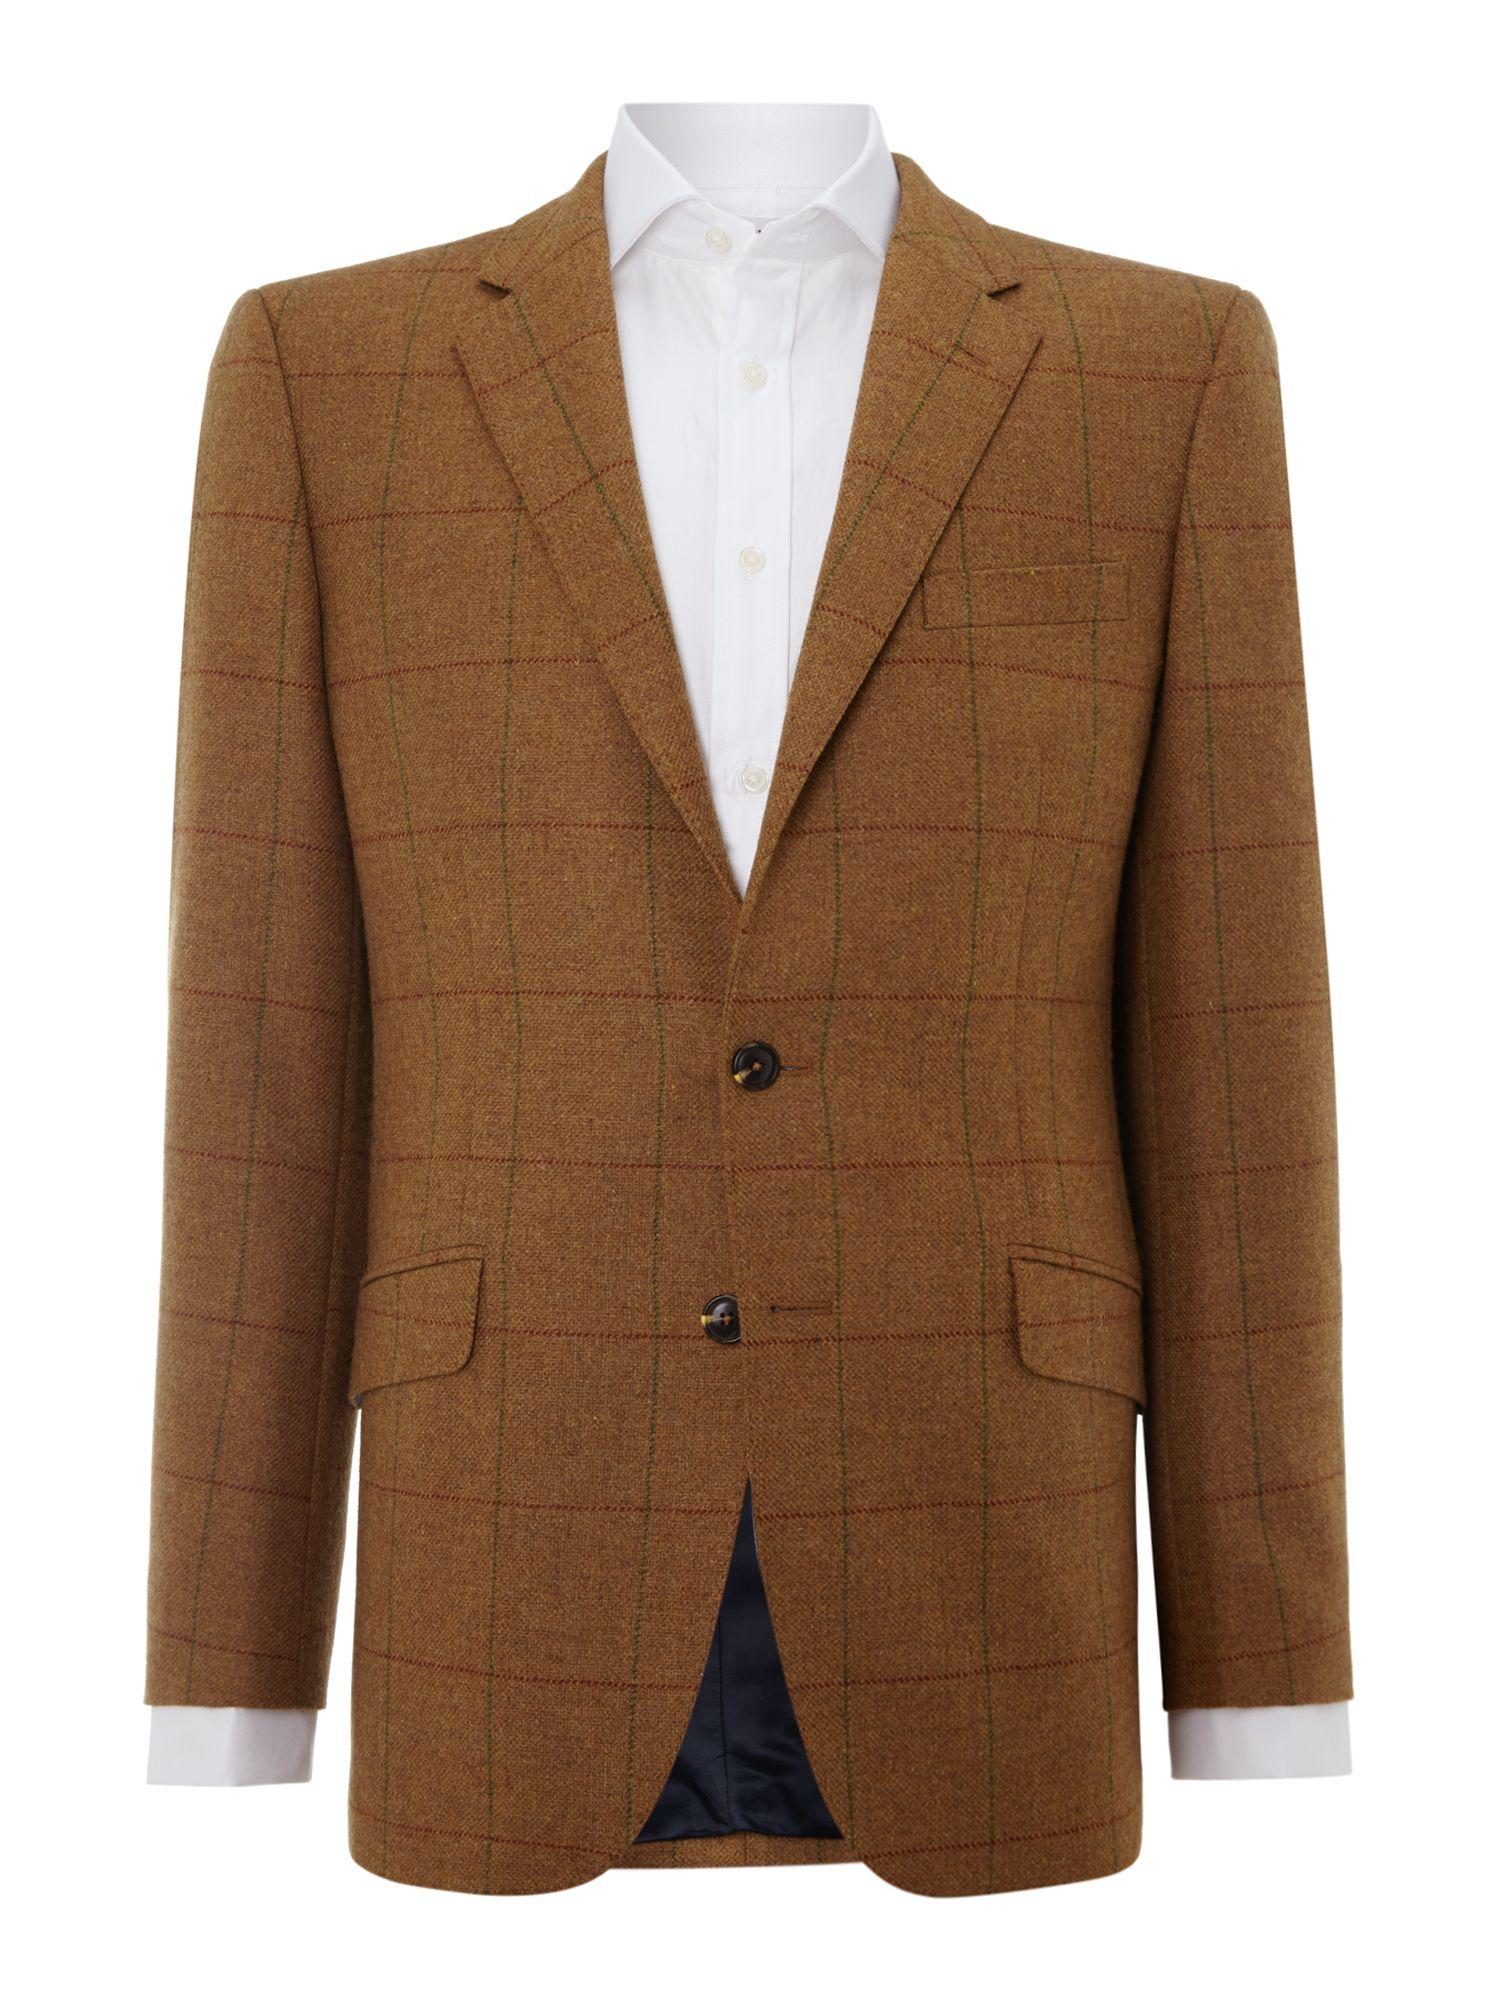 Lyst - Tm Lewin Casual Button Blazer In Brown For Men